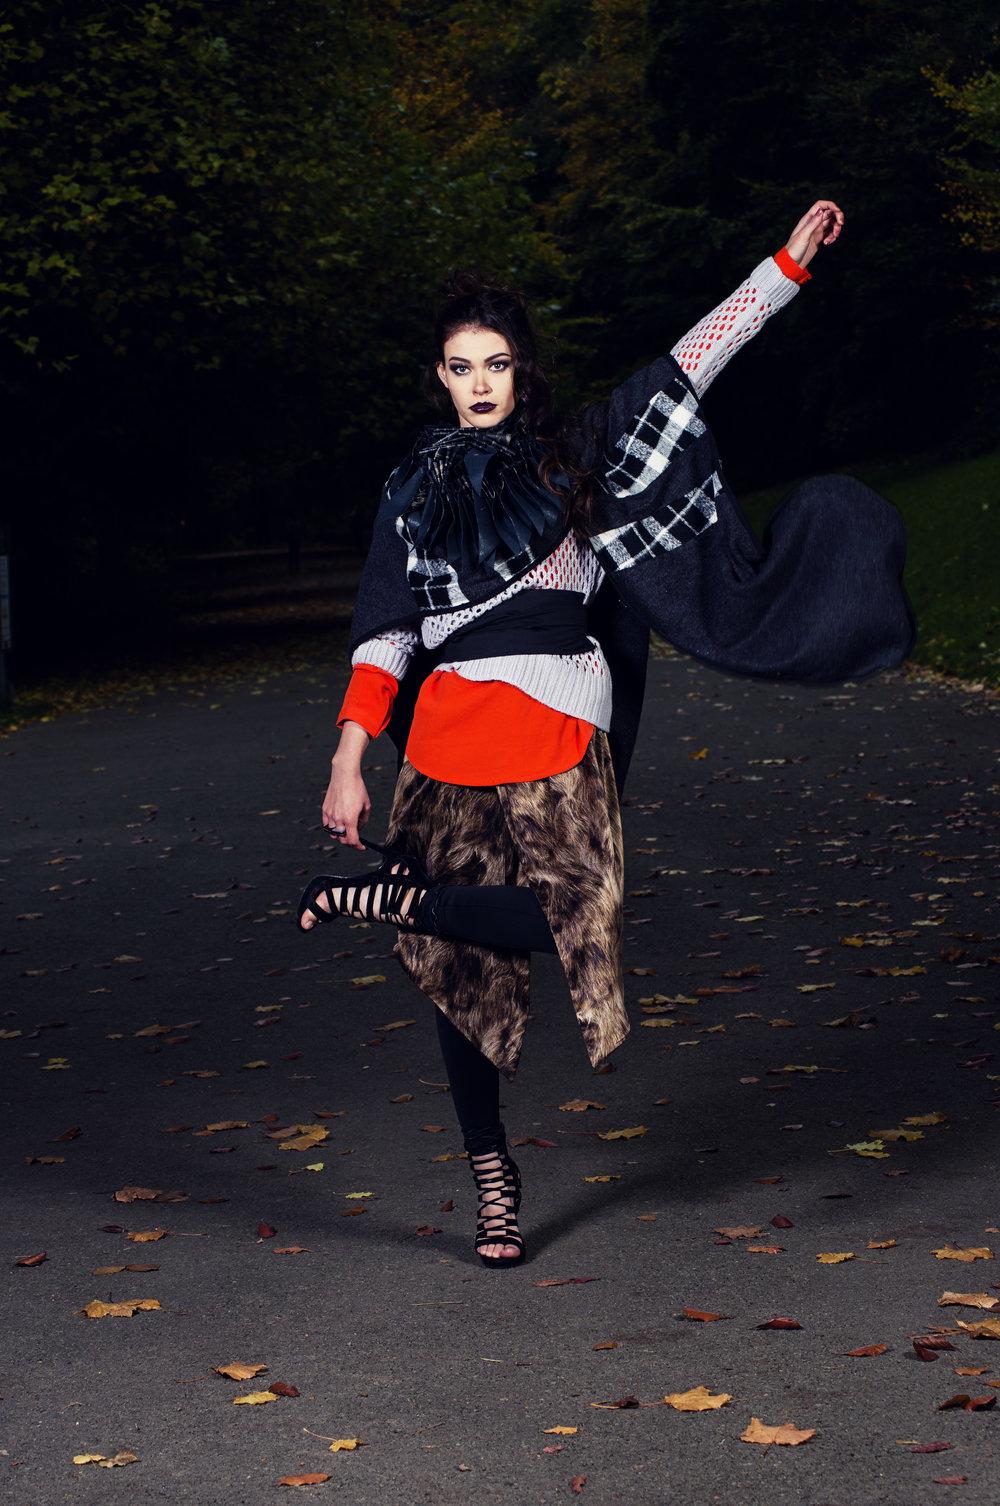 zaramia-ava-zaramiaava-leeds-fashion-designer-ethical-sustainable-tailored-minimalist-jacket-accent-coat-jacket-print-shirt-top-versatile-drape-cowl-styling-shop-womenswear-models-photoshoot-colour-1